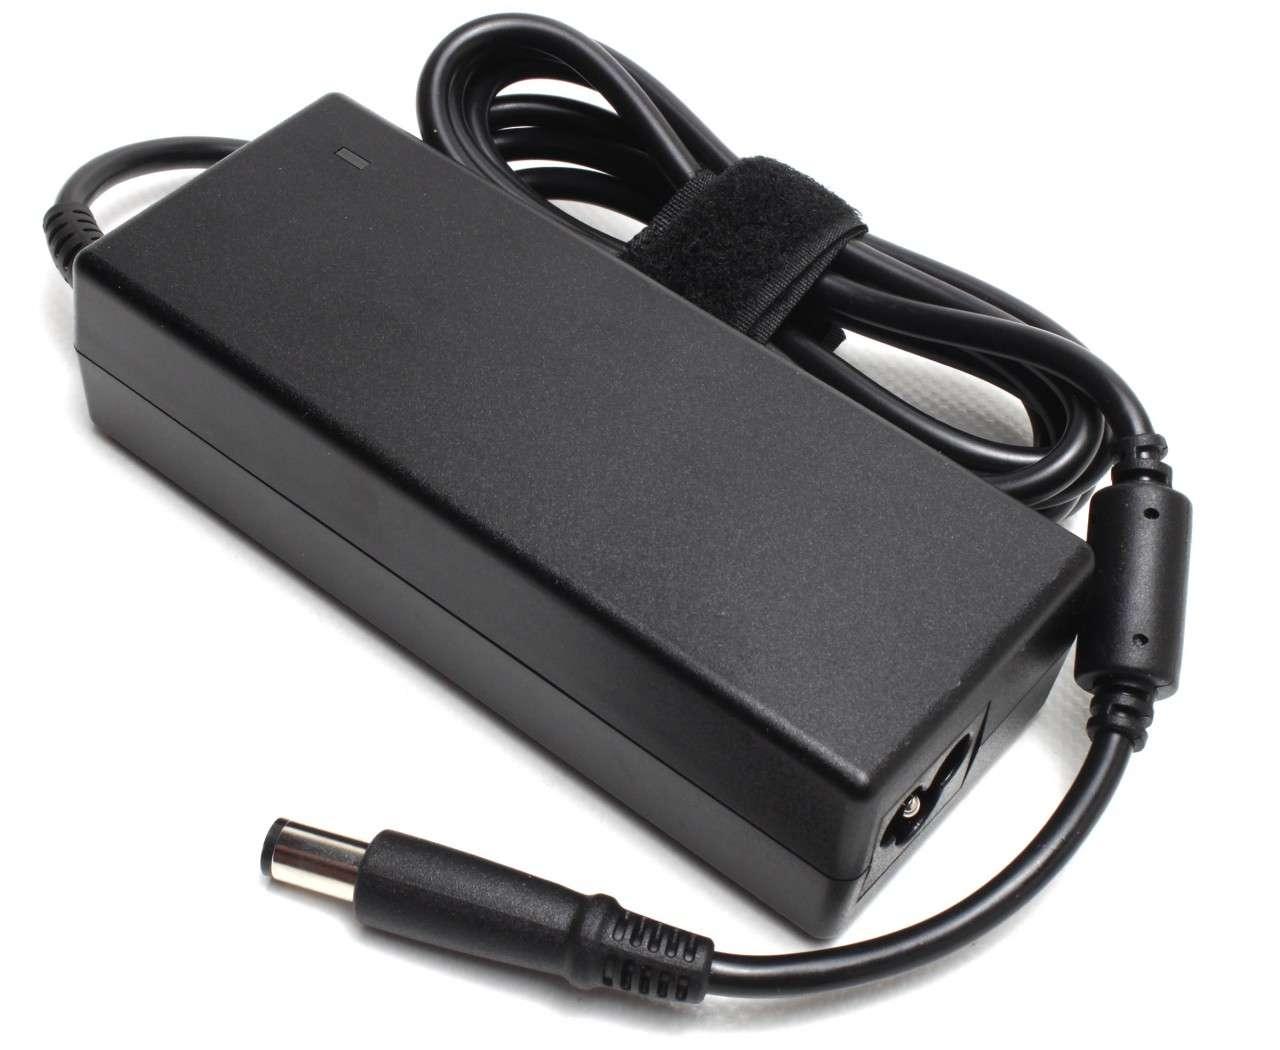 Incarcator Dell Latitude D620 VARIANTA 3 imagine powerlaptop.ro 2021